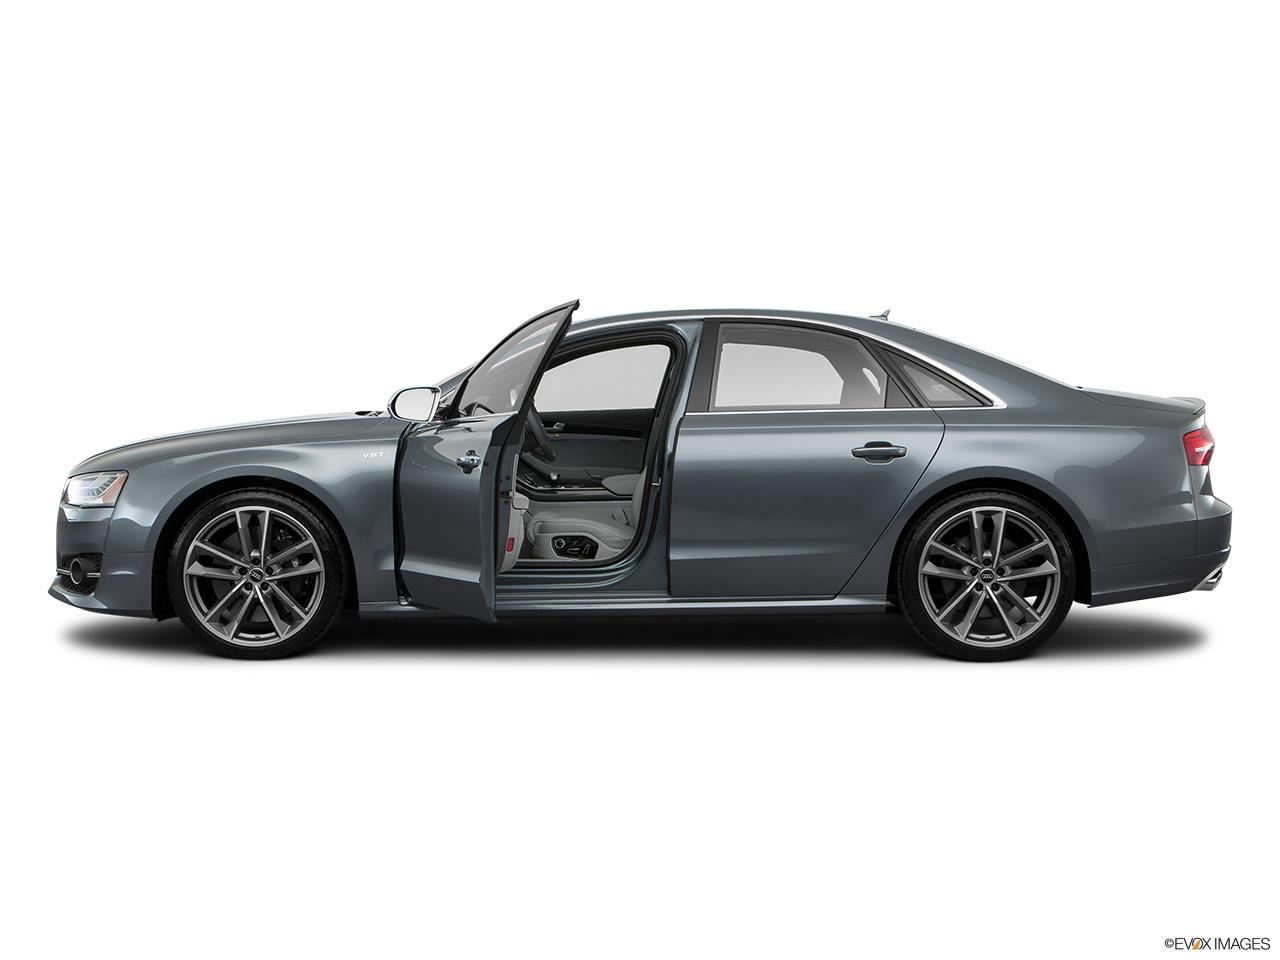 audi s8 2017 plus 4 0 tfsi quattro 605 hp in saudi arabia new car prices specs reviews. Black Bedroom Furniture Sets. Home Design Ideas